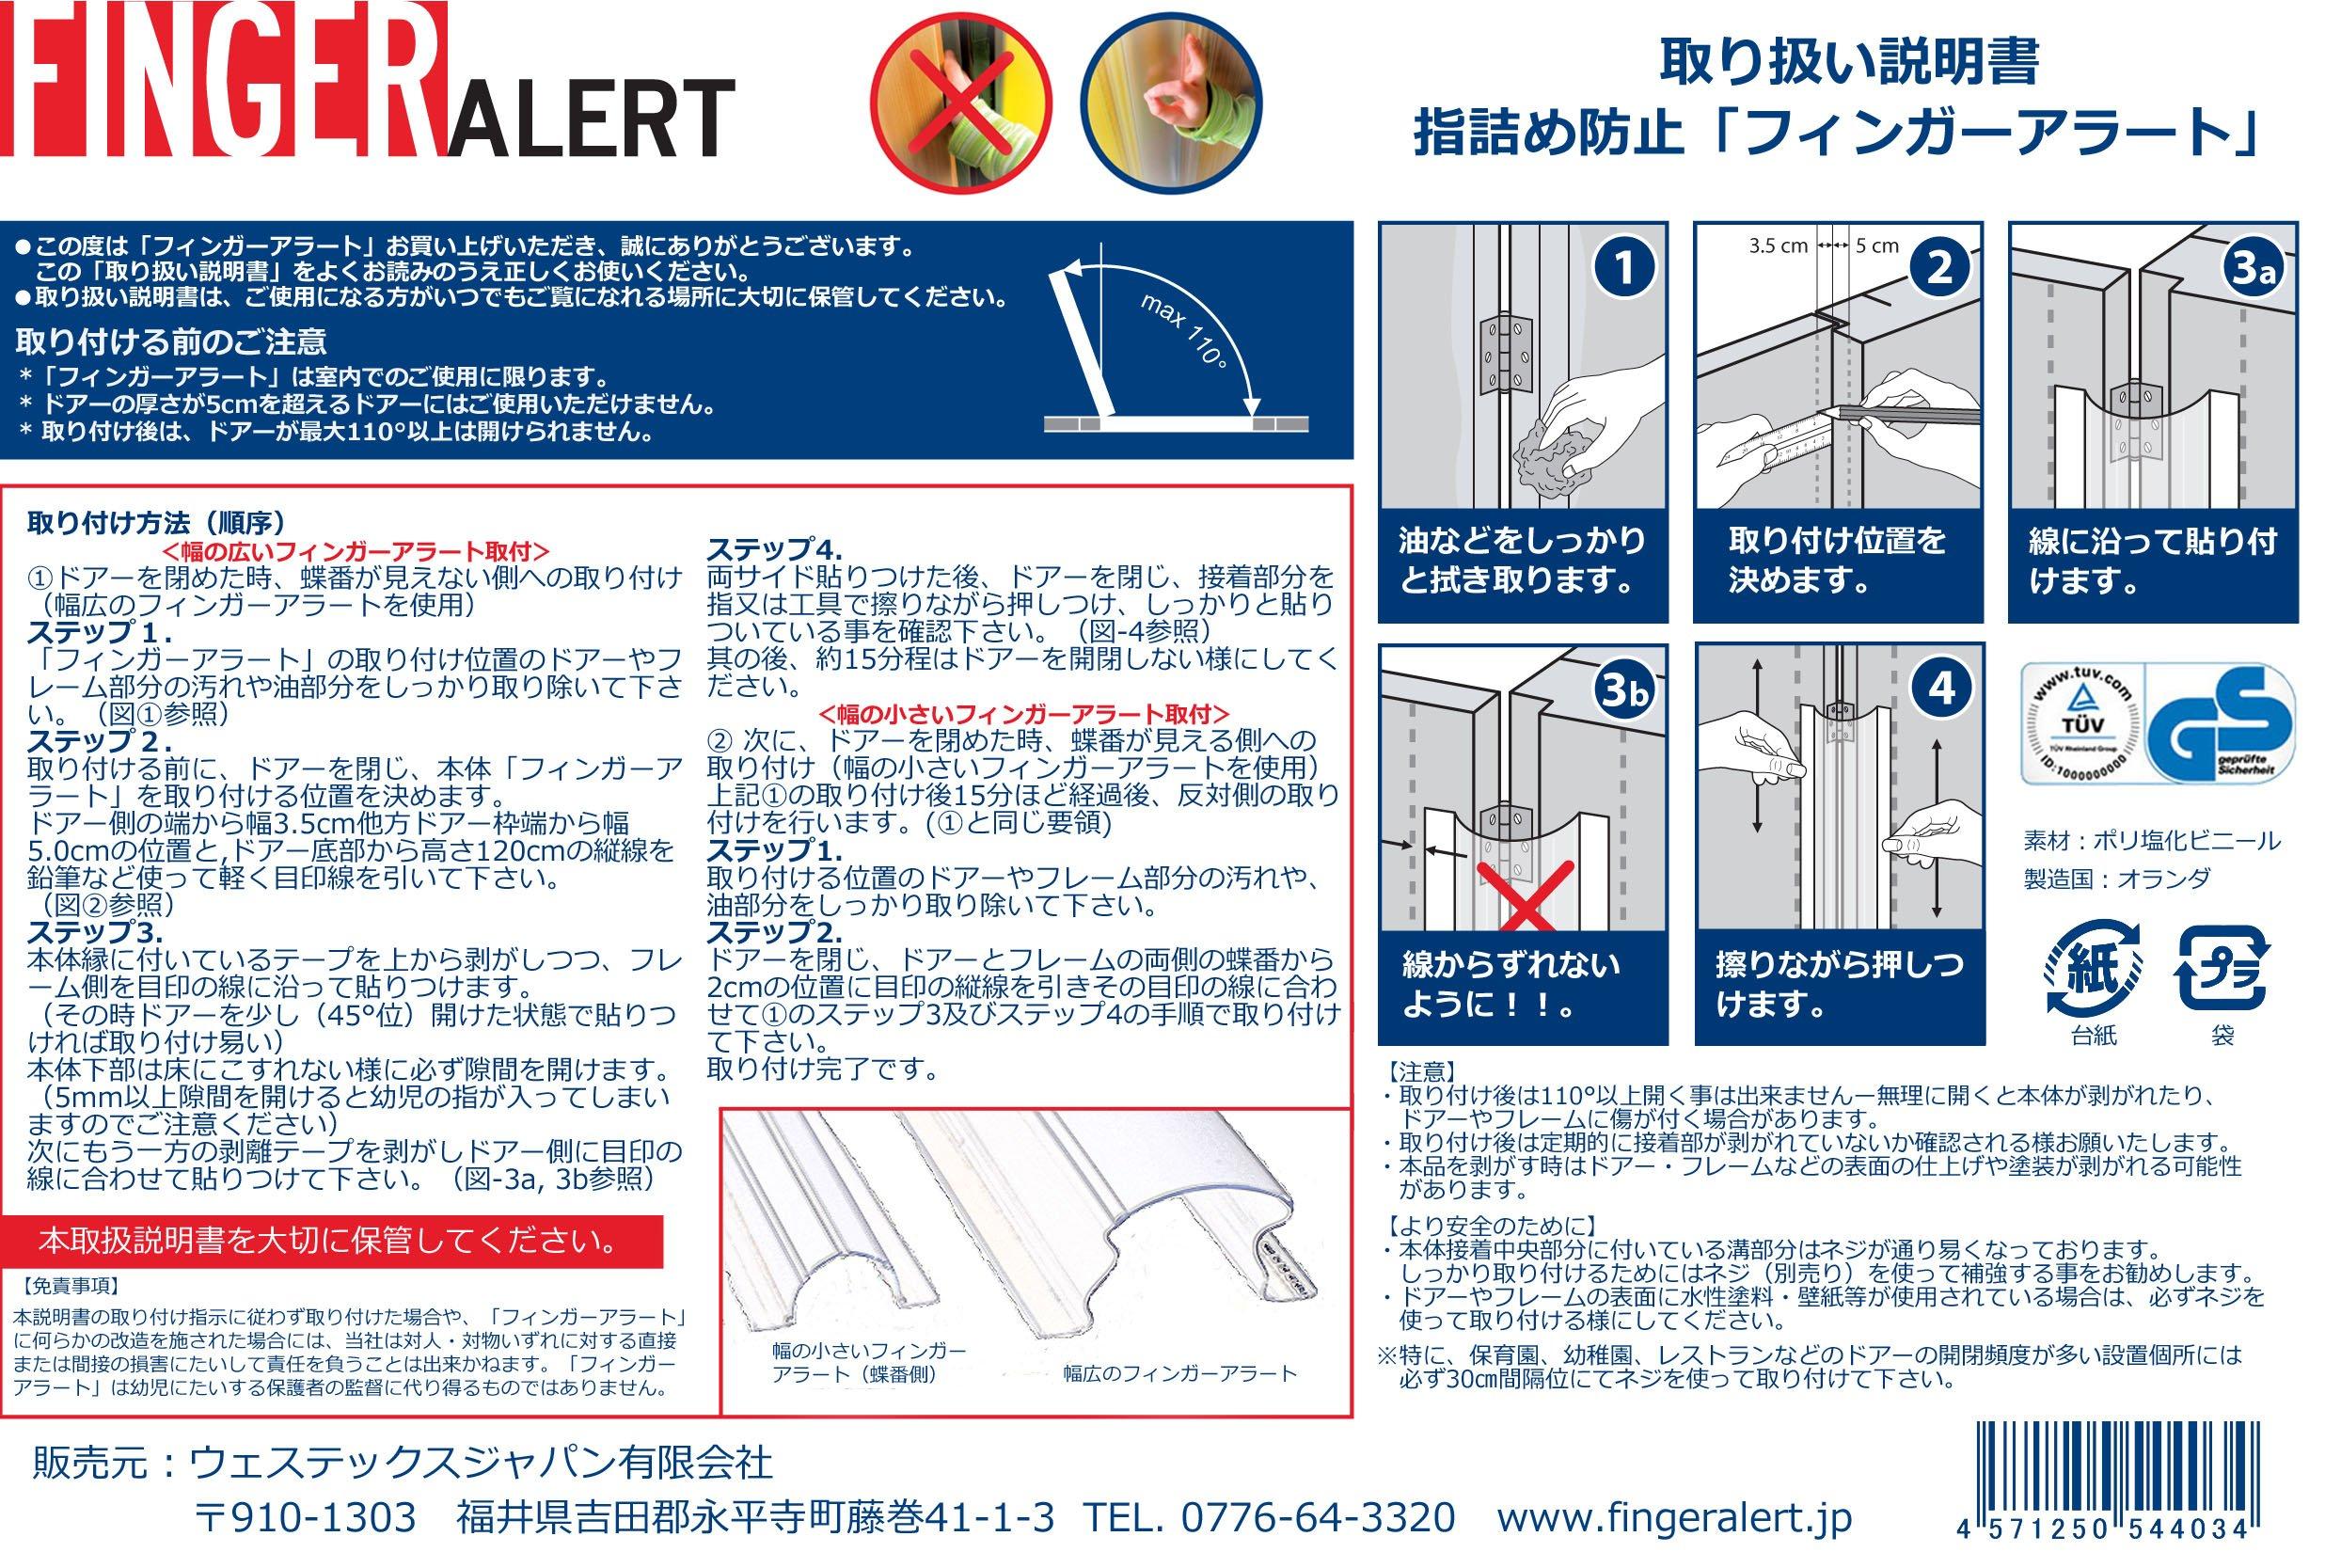 Finger Alert 1500mm (finger alert) finger scissors prevention cover 0-year-old to 6-year-old one set (cover for the front side, the back side) semi-transparent by Finger Alert (Image #6)